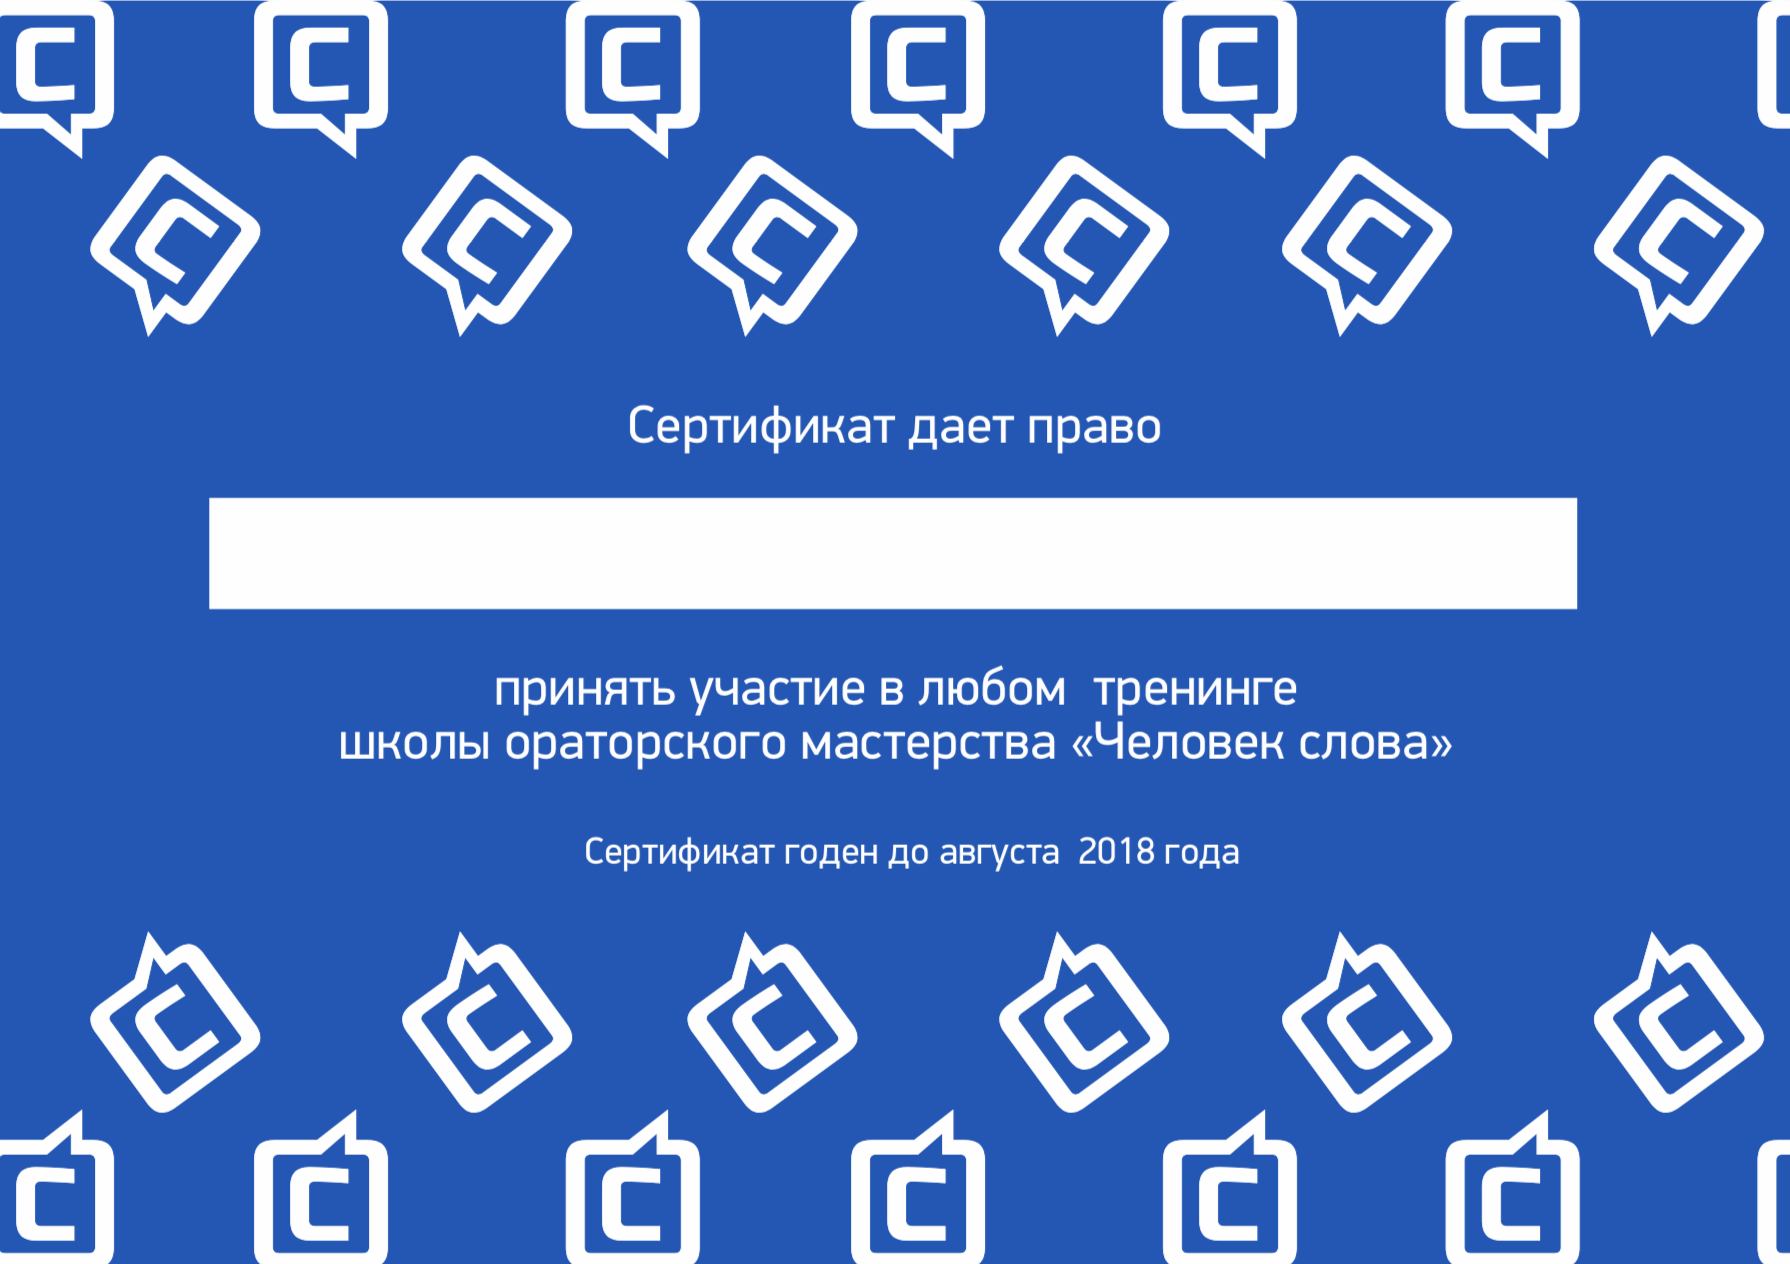 Снимок экрана 2018-12-13 в 18.08.32